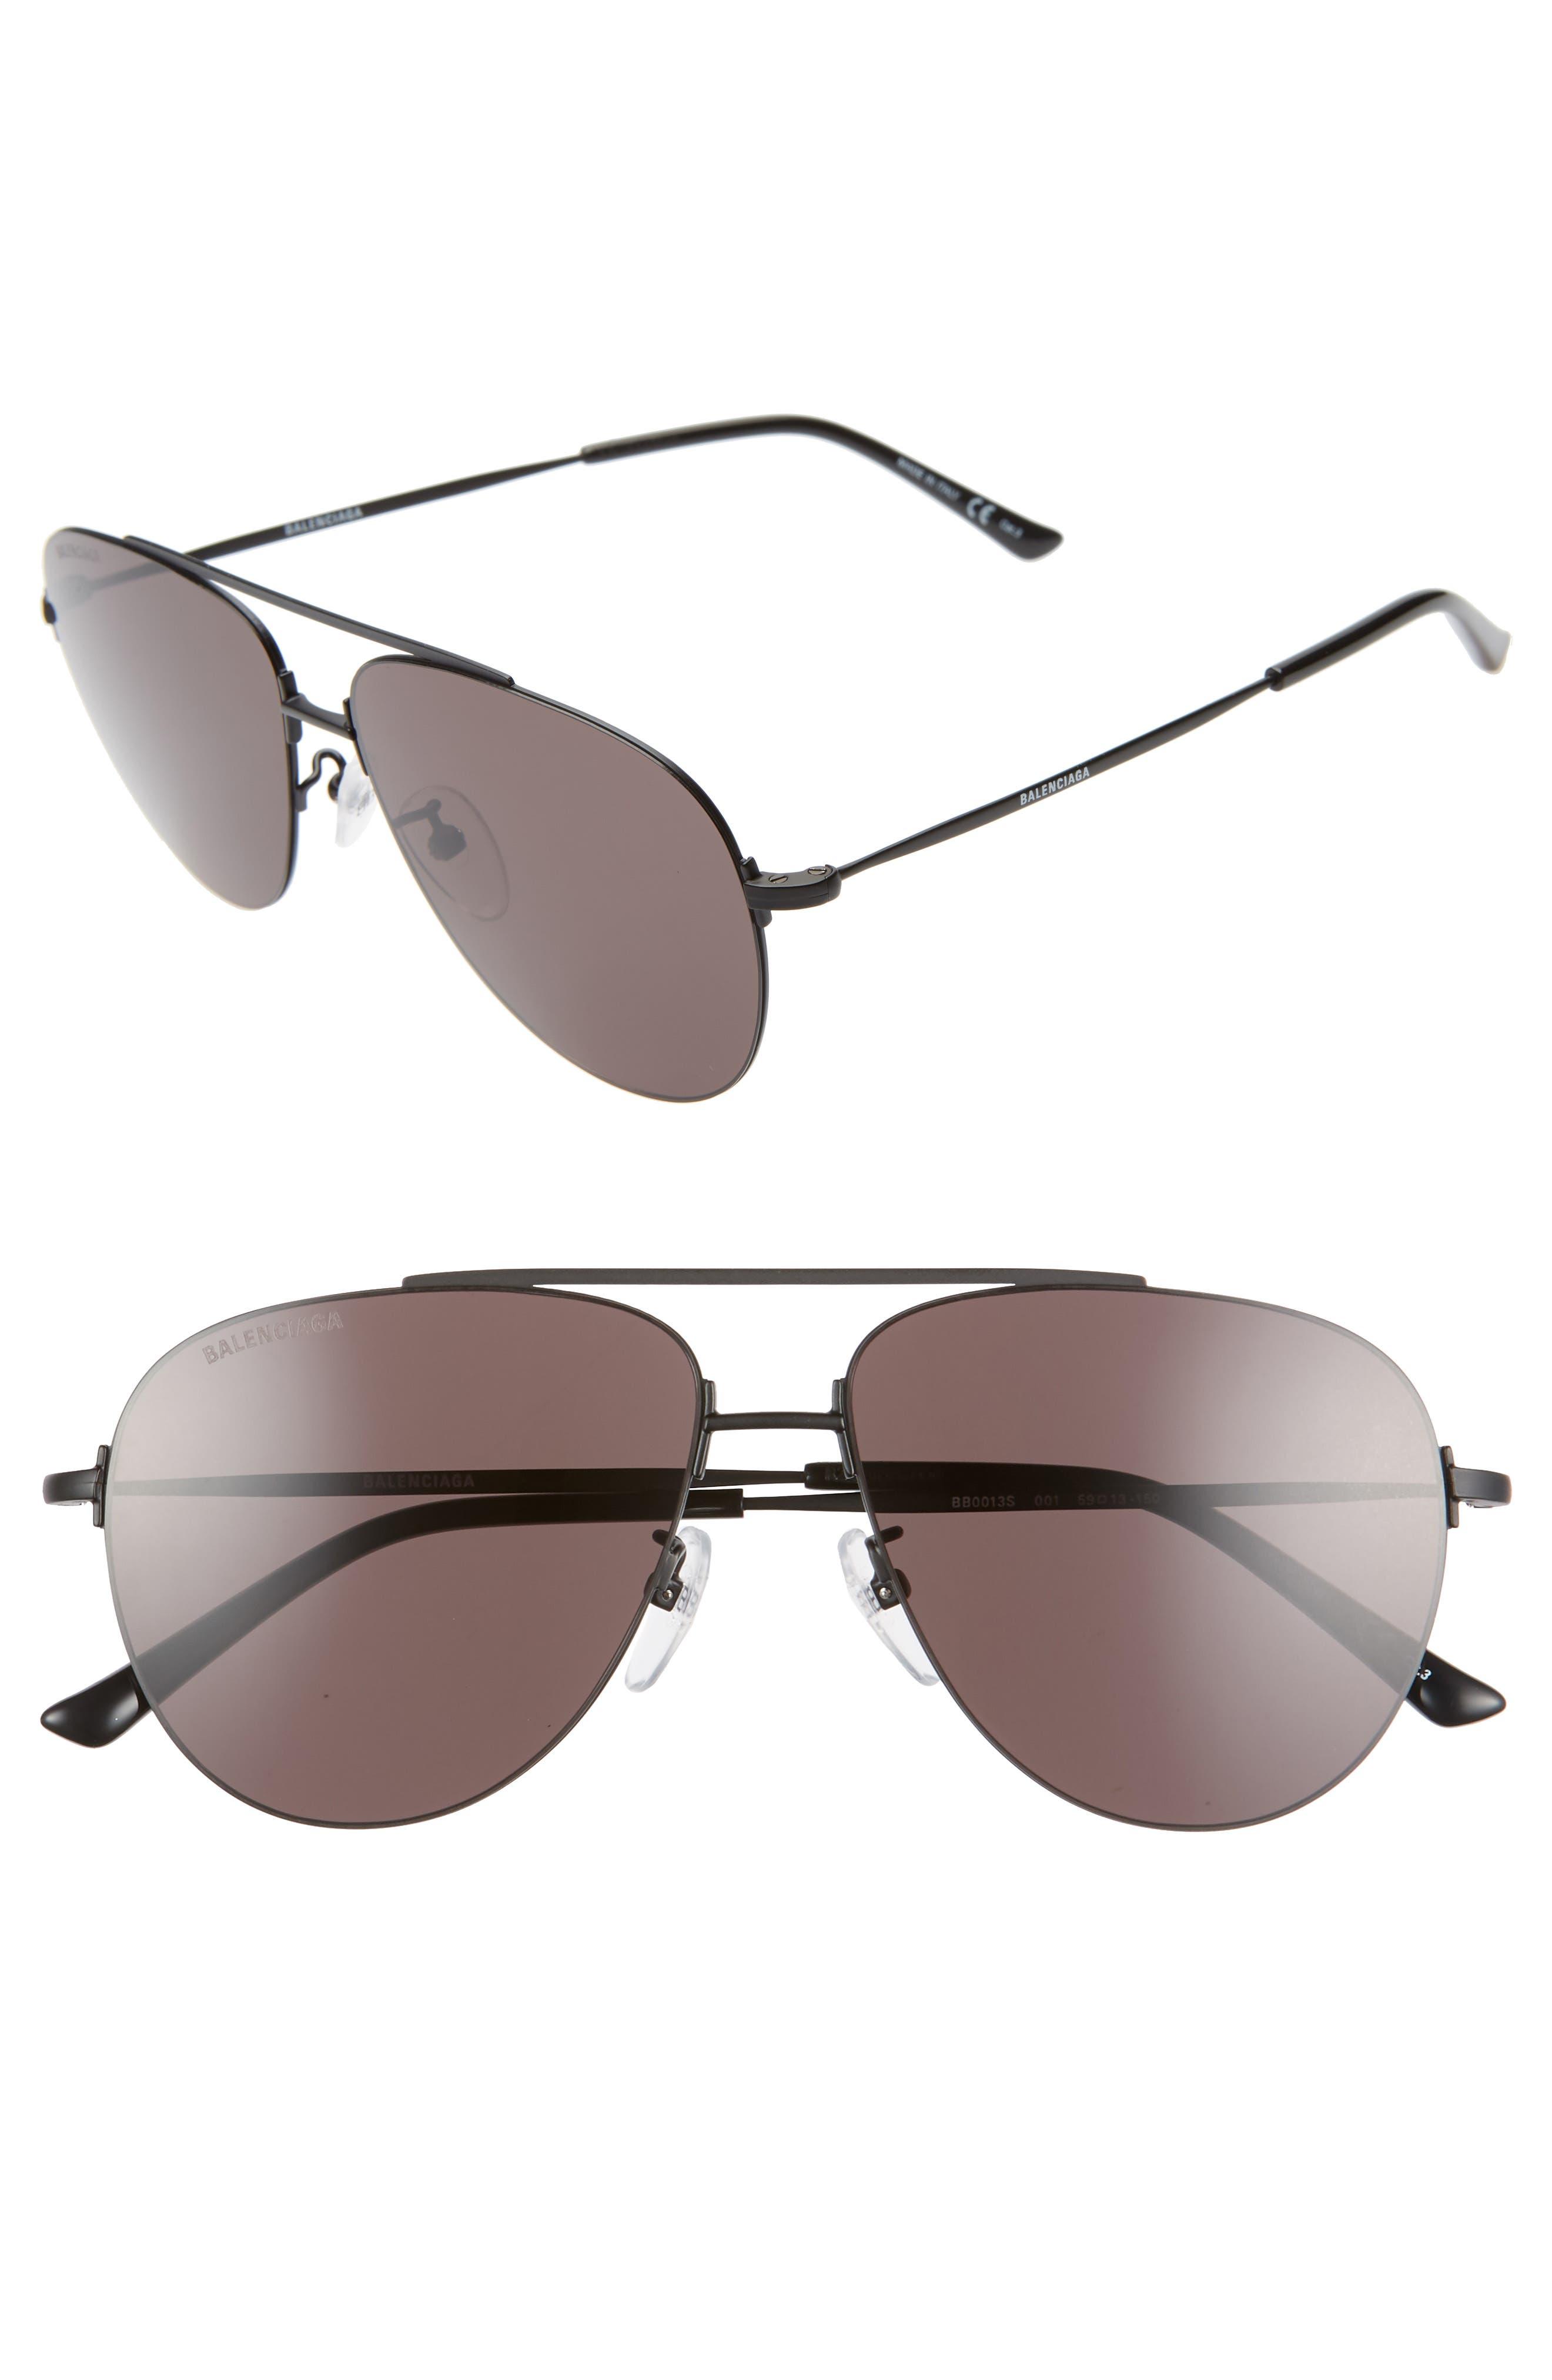 Balenciaga 59mm Aviator Sunglasses